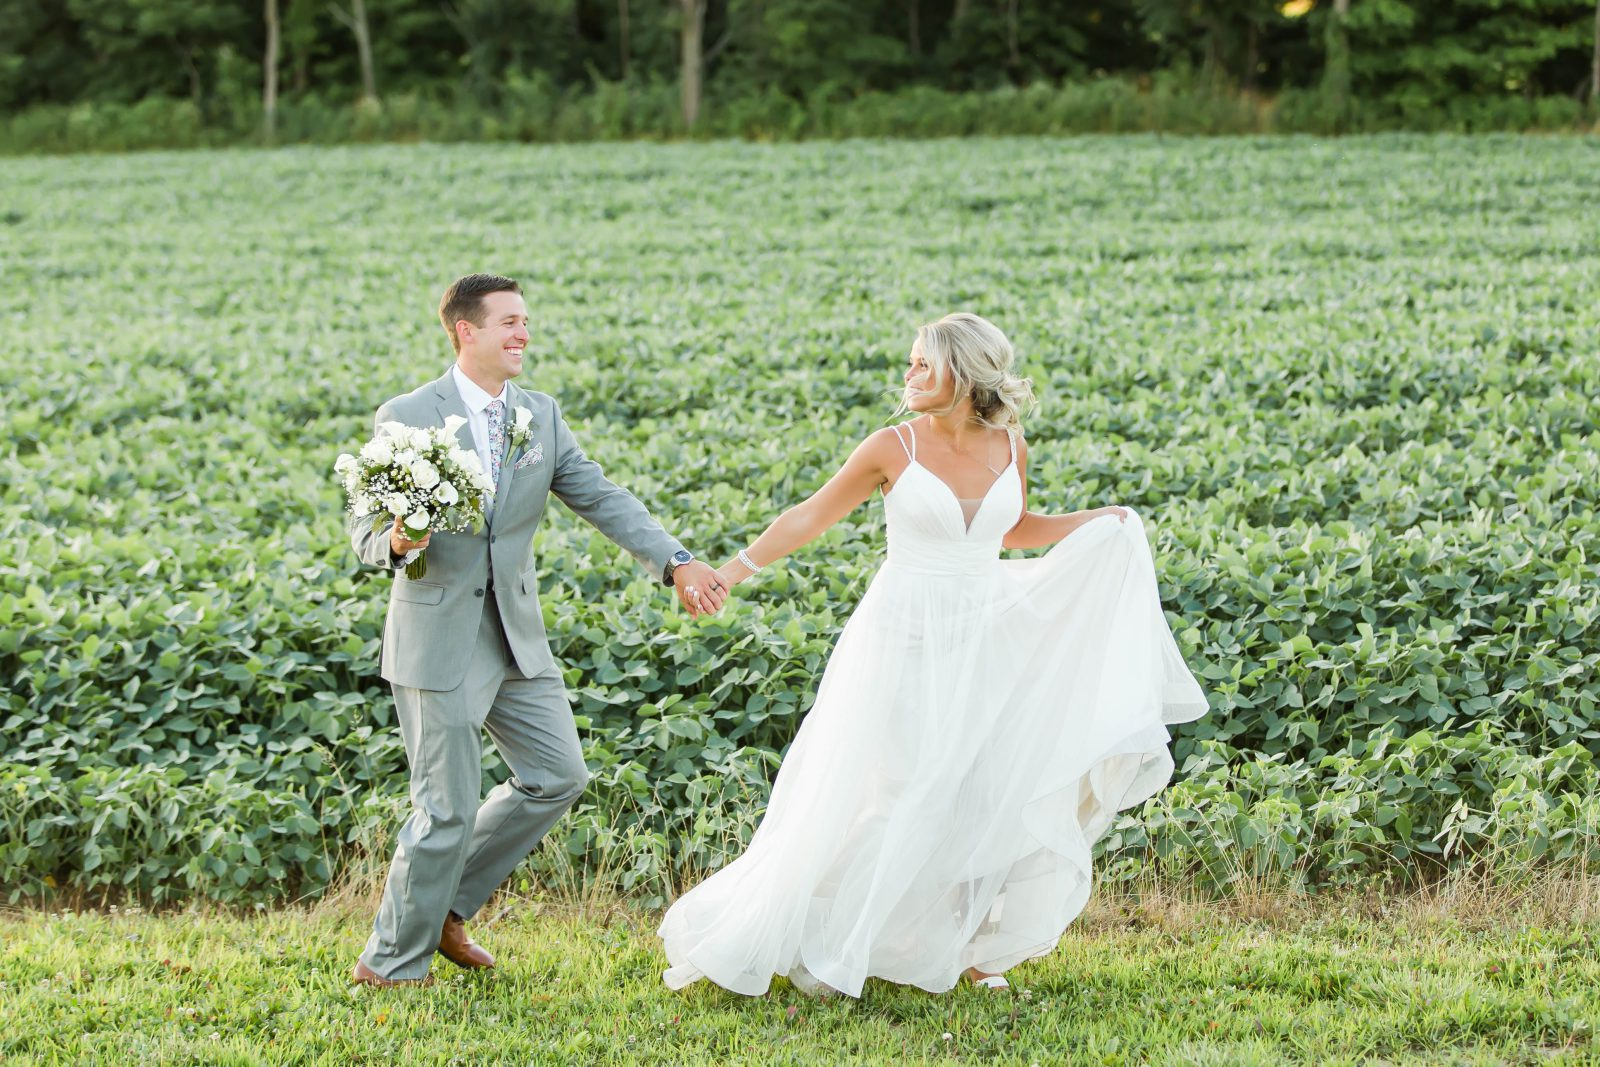 peacock-ridge-summer-wedding-photographer-akron-ohio-loren-jackson-photography-116